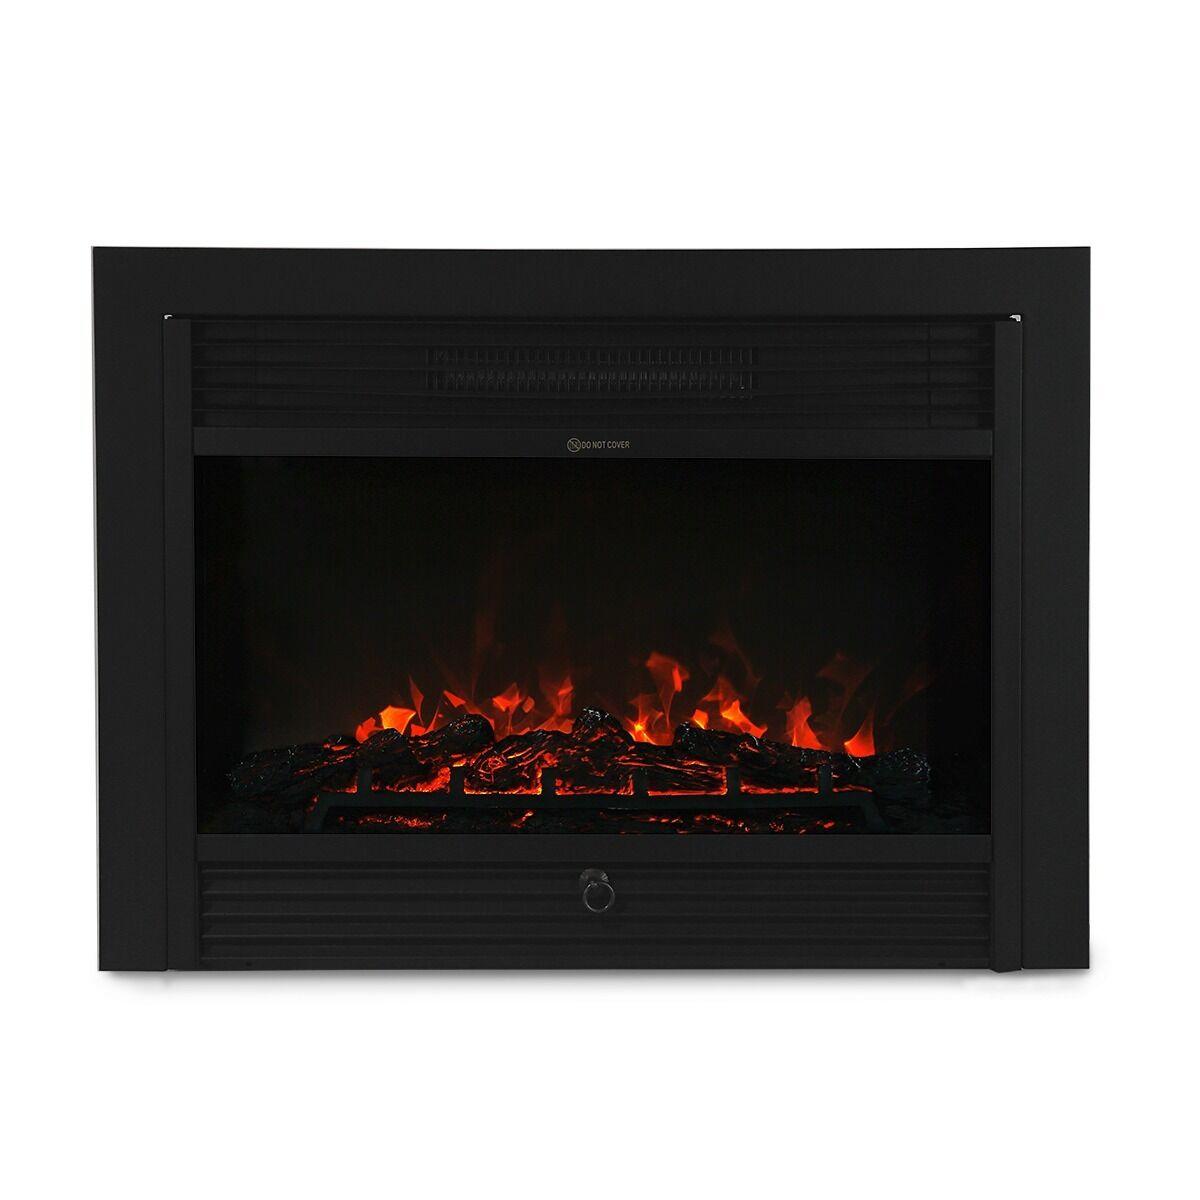 28 5 Embedded Electric Fireplace Insert Heater Remote Realistic Wood Log Glow Ebay